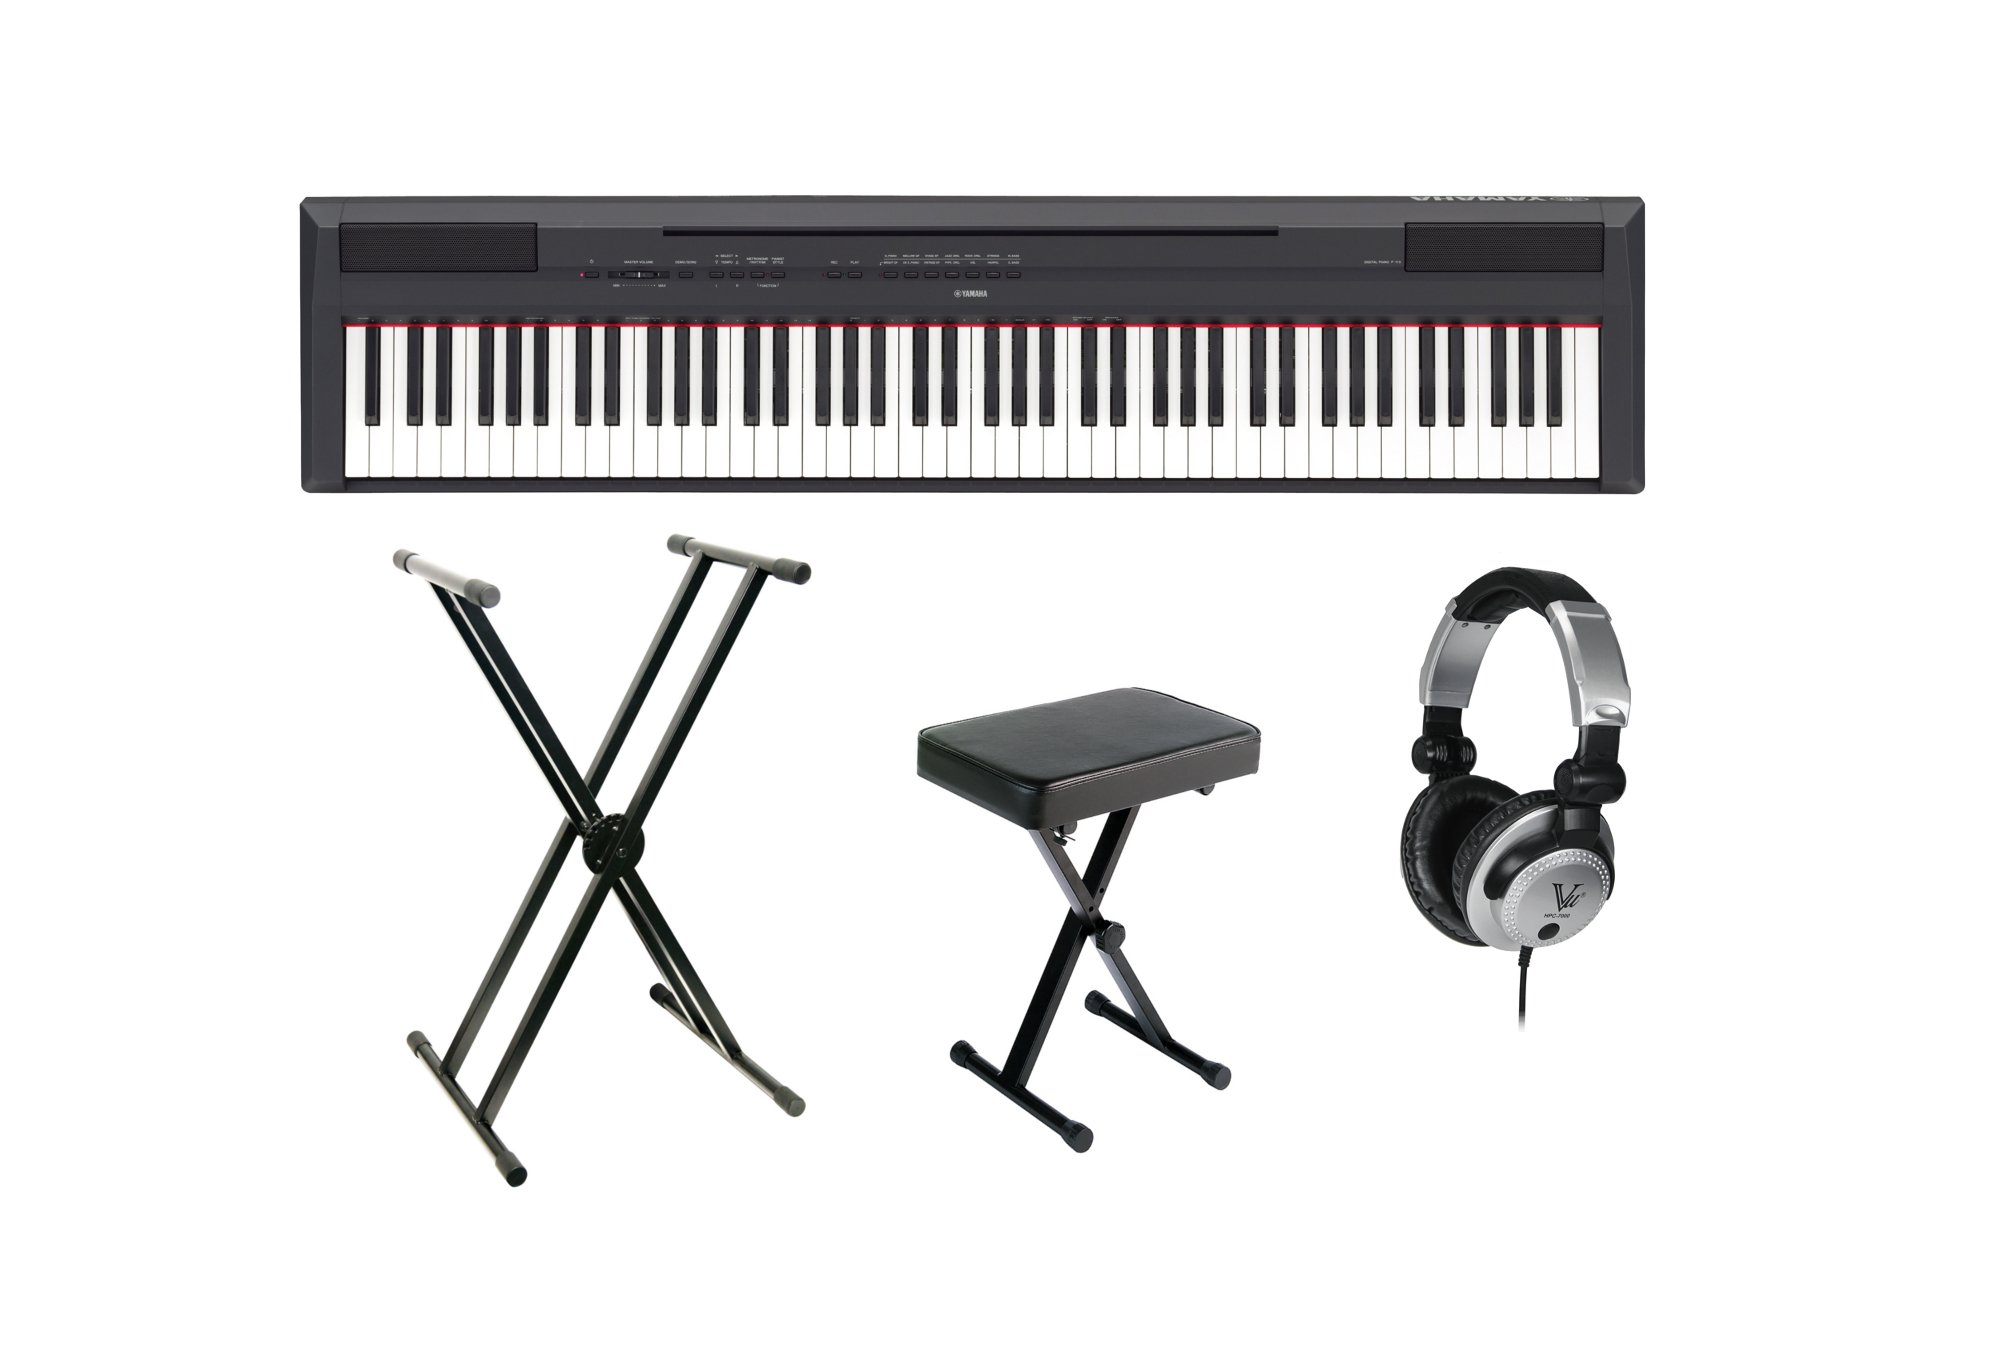 Yamaha P115B / Stand / Bench / Headphone Bundle P115B Digital Piano + Stand + Bench + Headphones P115B-BASICPCK-K